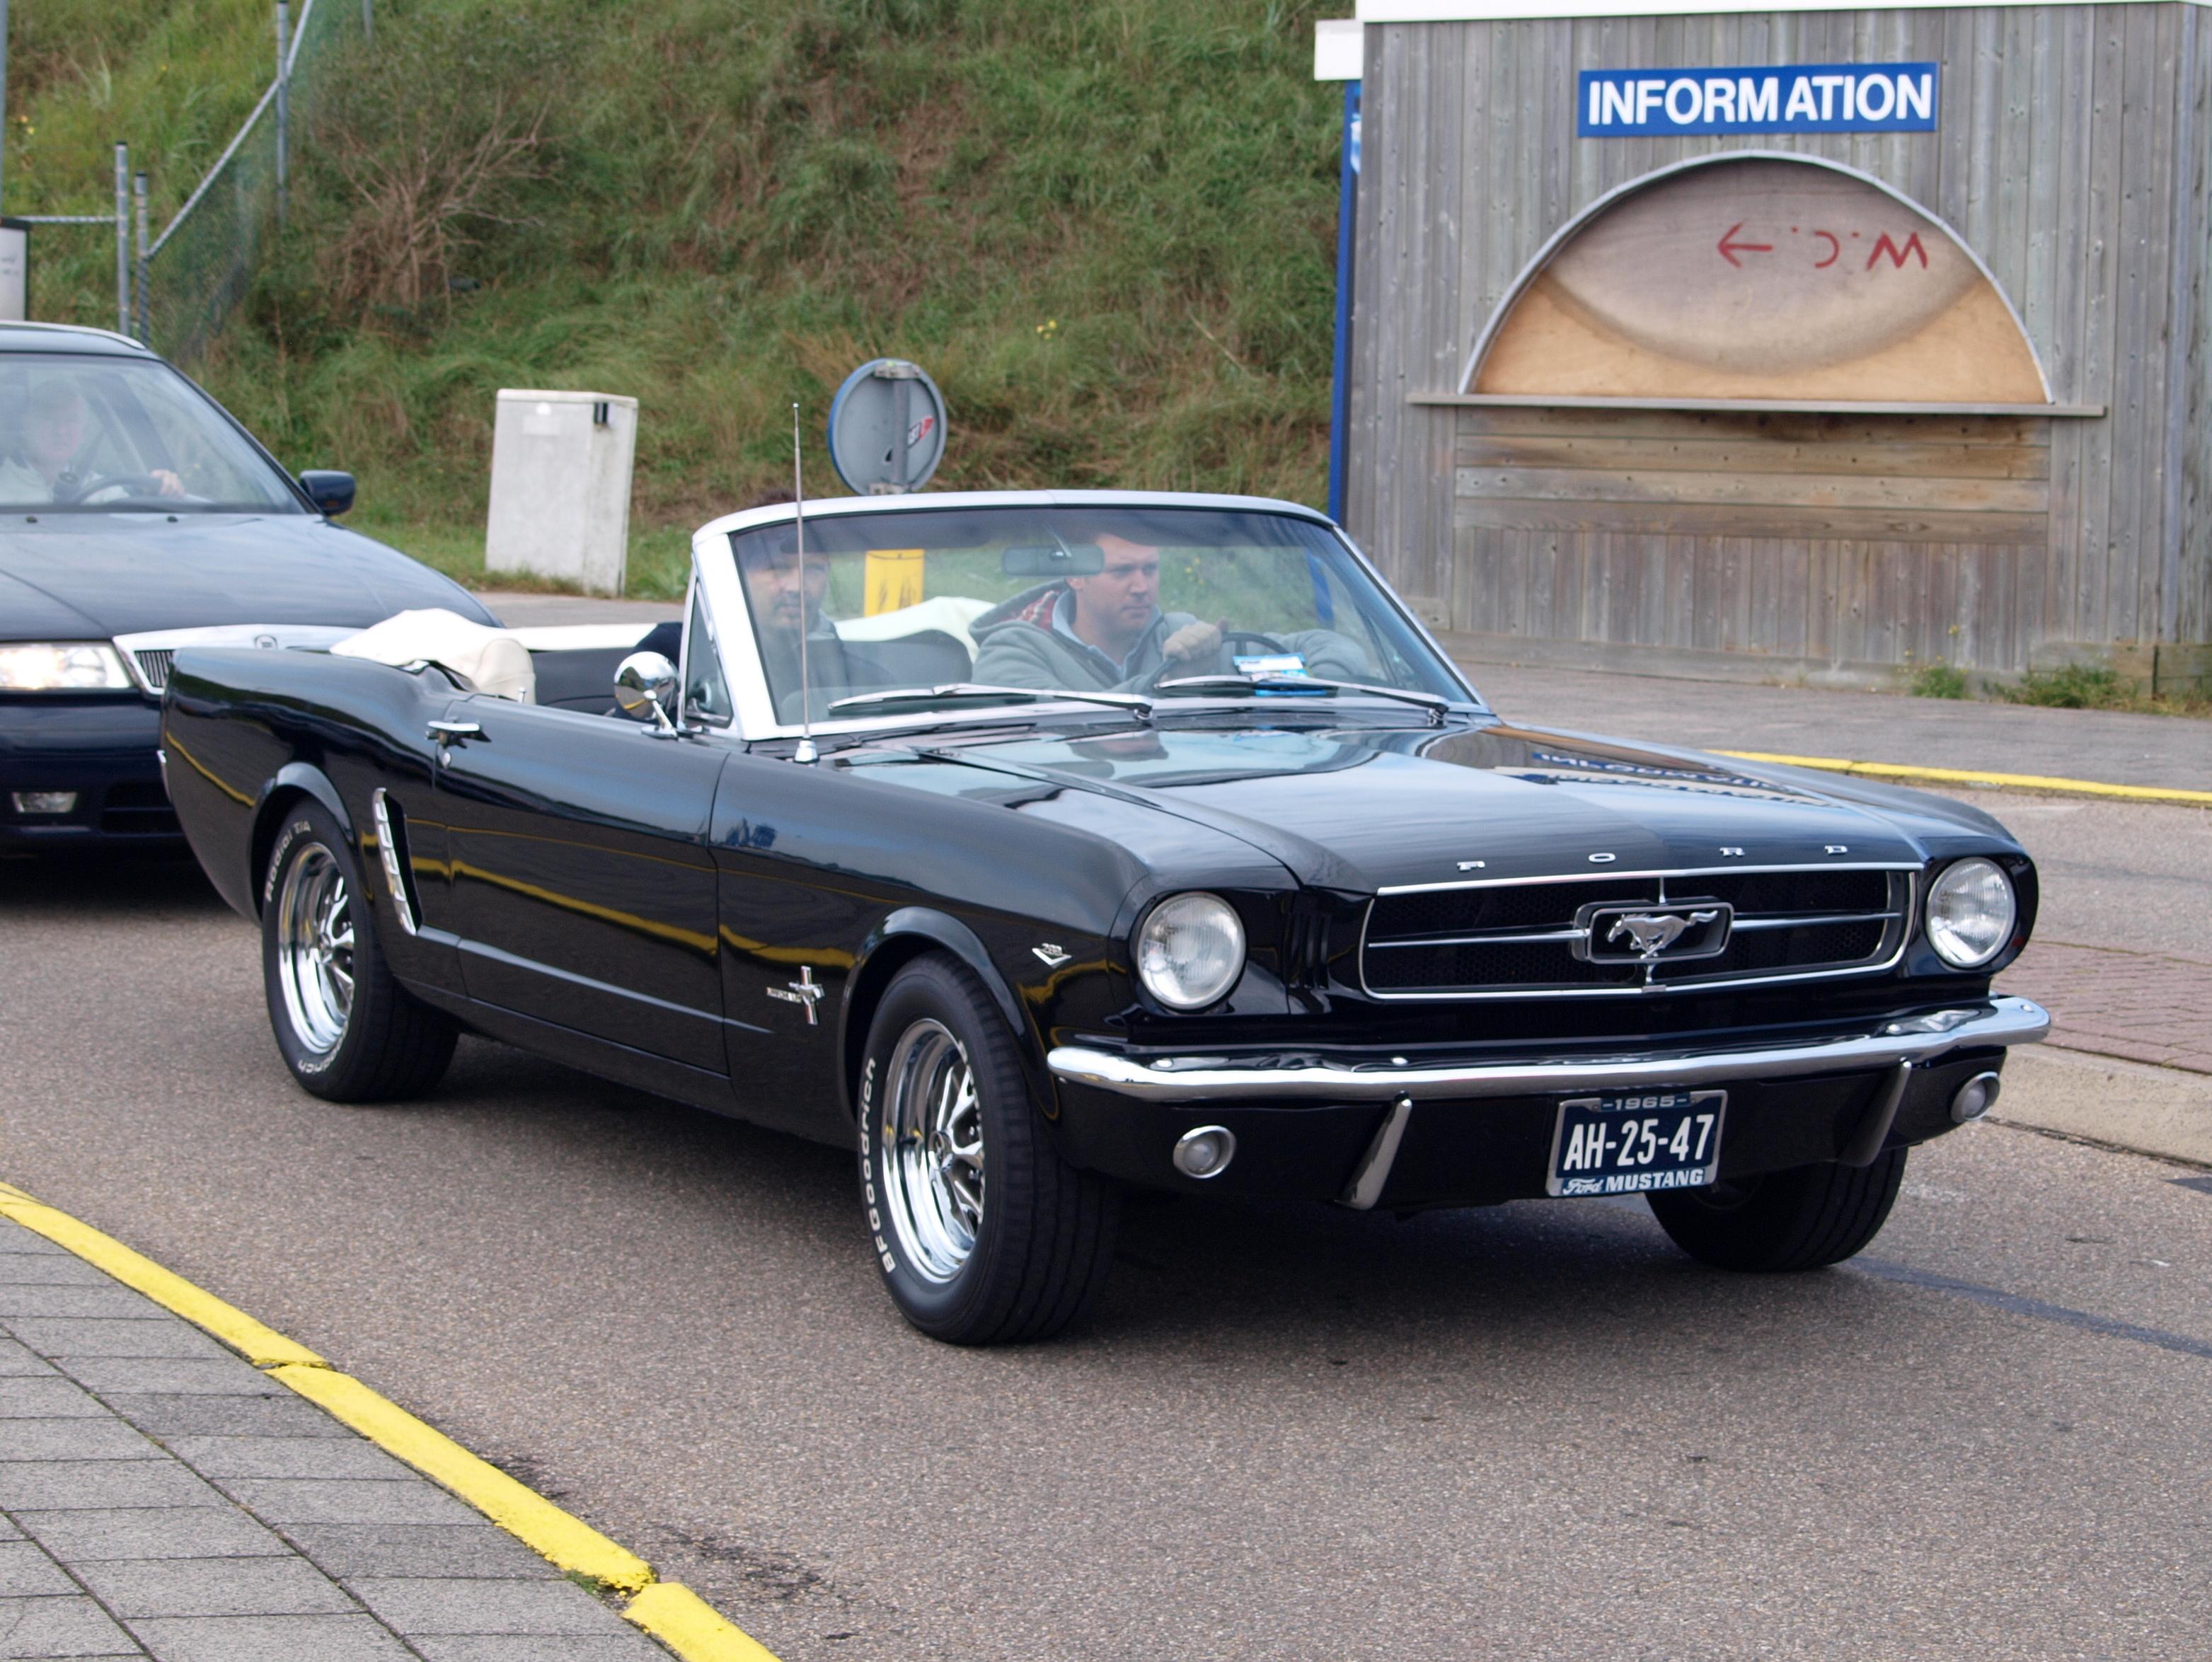 Top 20 Old Classic Vintage Cars For Women also VMR VB3 CSL Wheels Pontiac GTO G8 also 2004 Holden VZ Monaro likewise 237057 Yearone Bandit Wheels On A 4th Gen Help Please likewise Fondo Azul Degradado. on pontiac gto